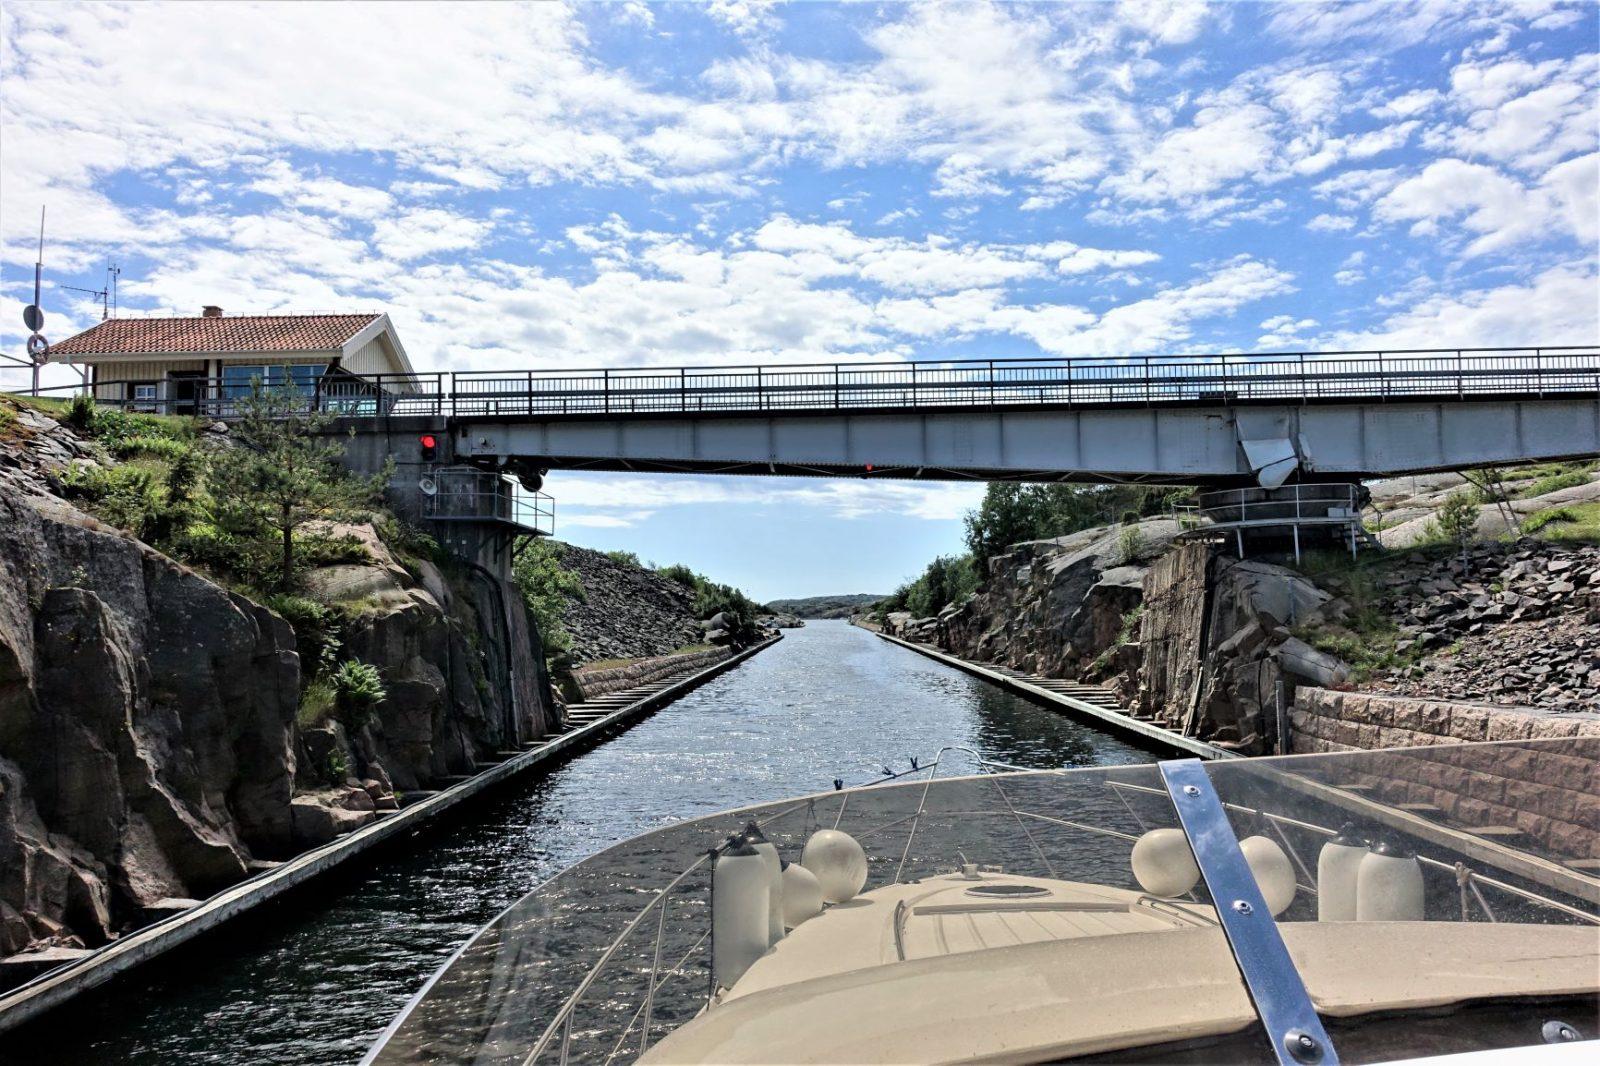 seiler under brua i sotenkanalen svenskekysten